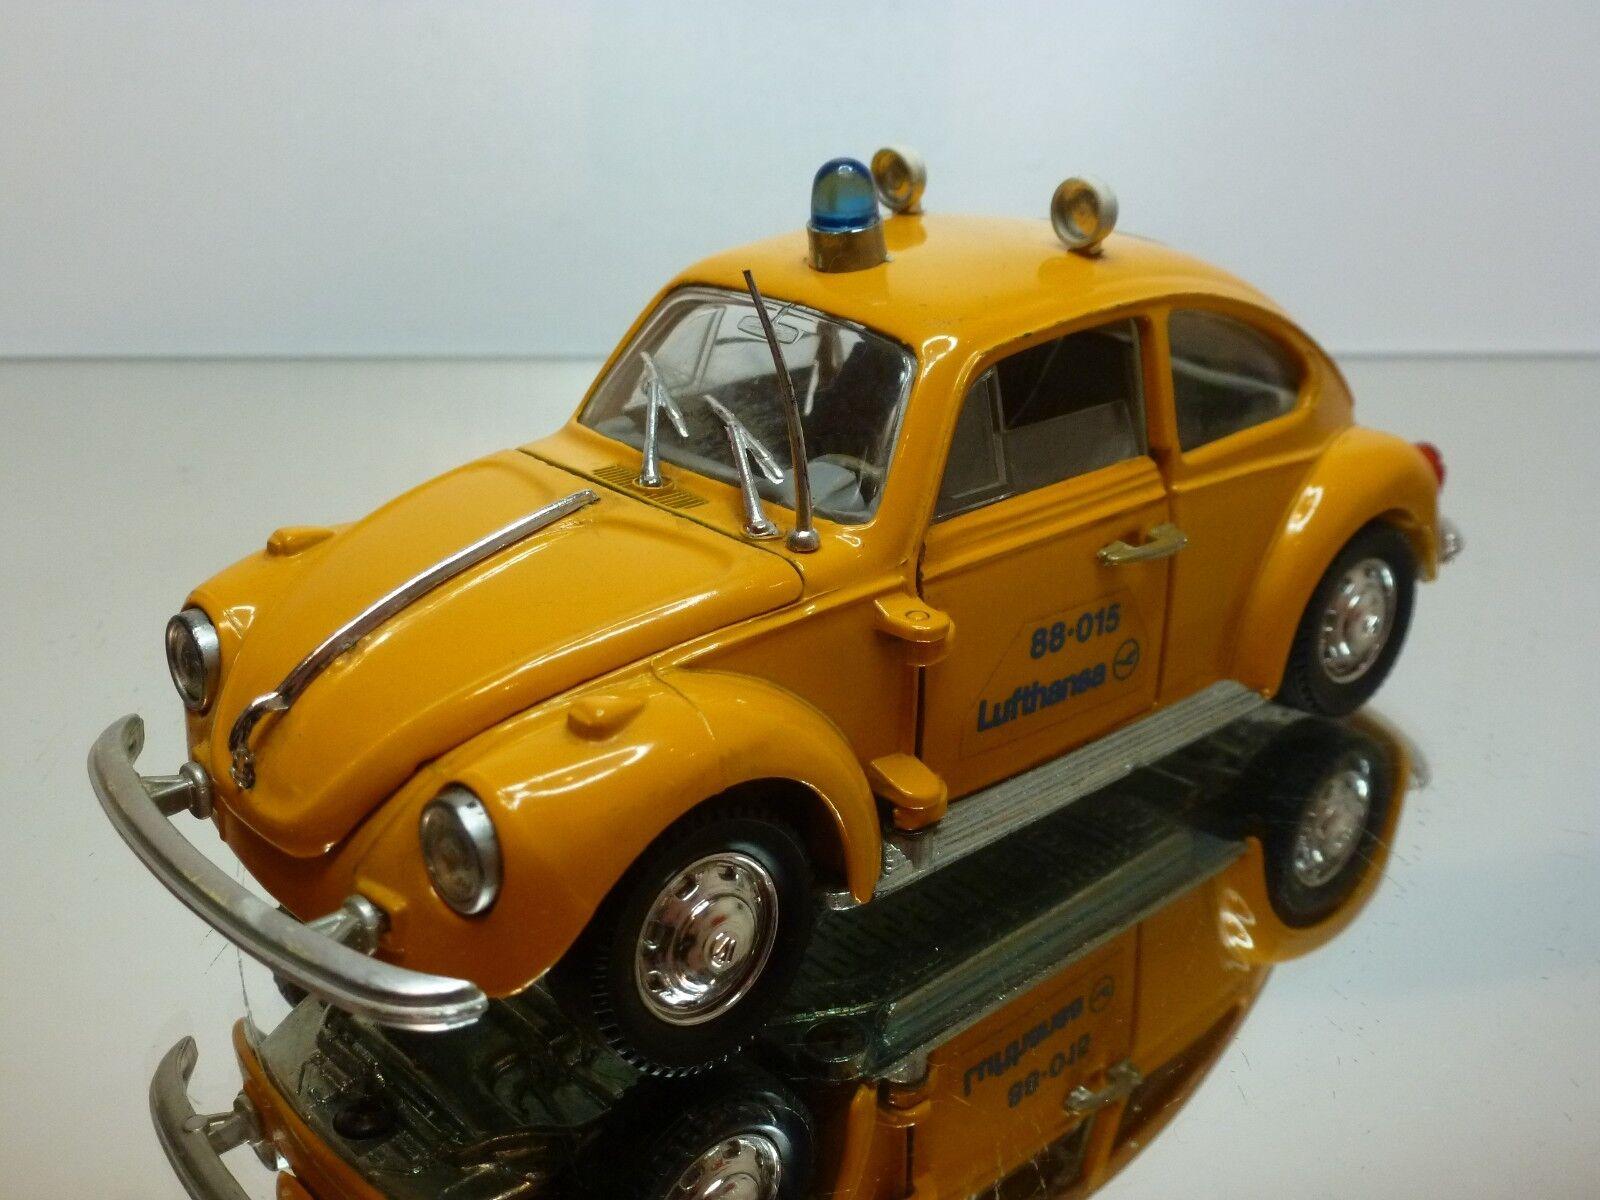 POLISTIL S15 S44 VW VOLKSWAGEN BEETLE LUFTHANSA - giallo 1:25 - GOOD CONDITION